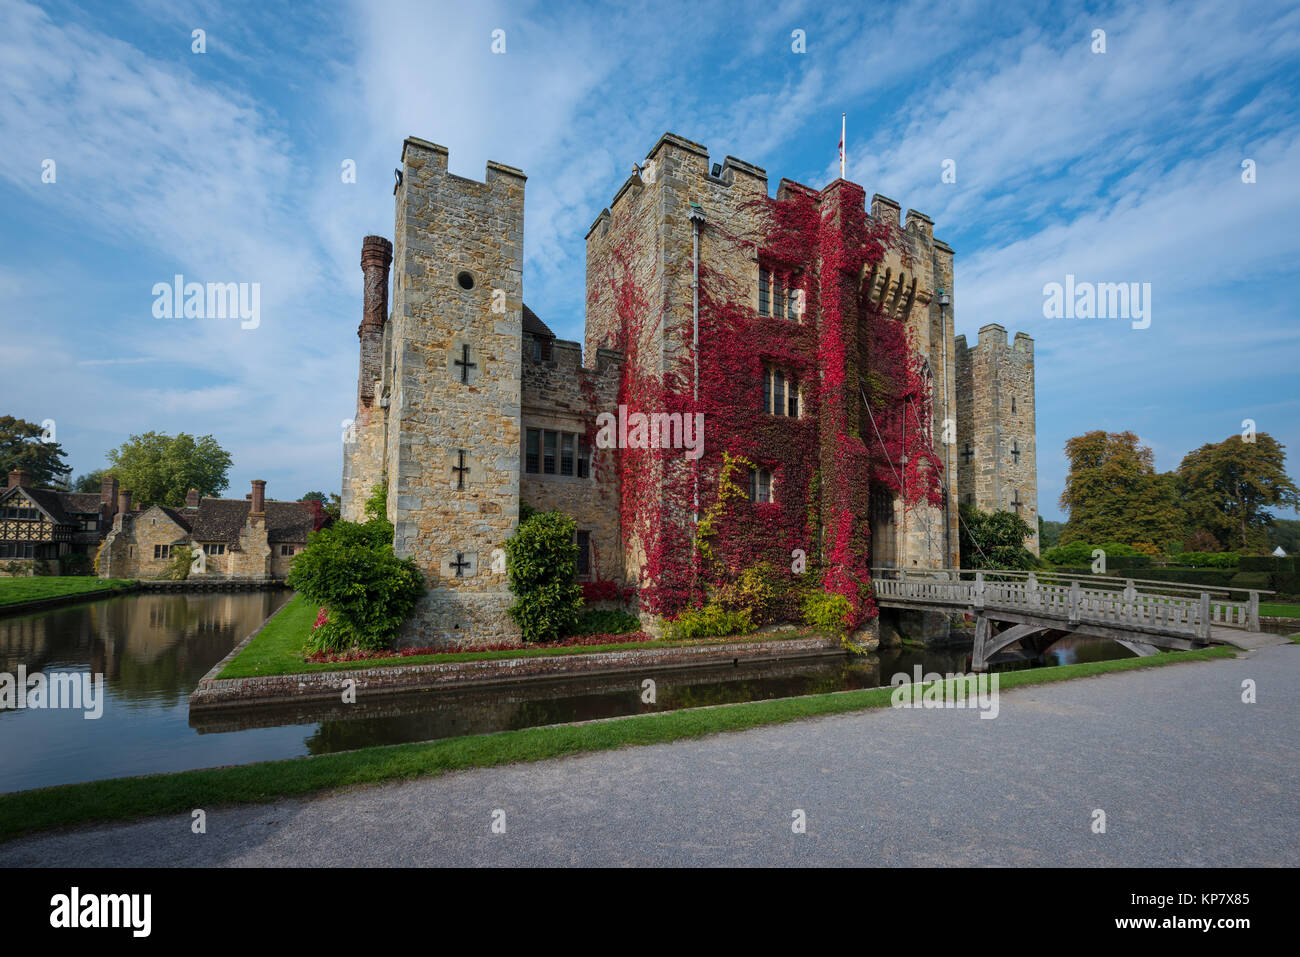 Hever Castle near Edenbridge, the seat of the Boleyn family, Kent, United Kingdom - Stock Image